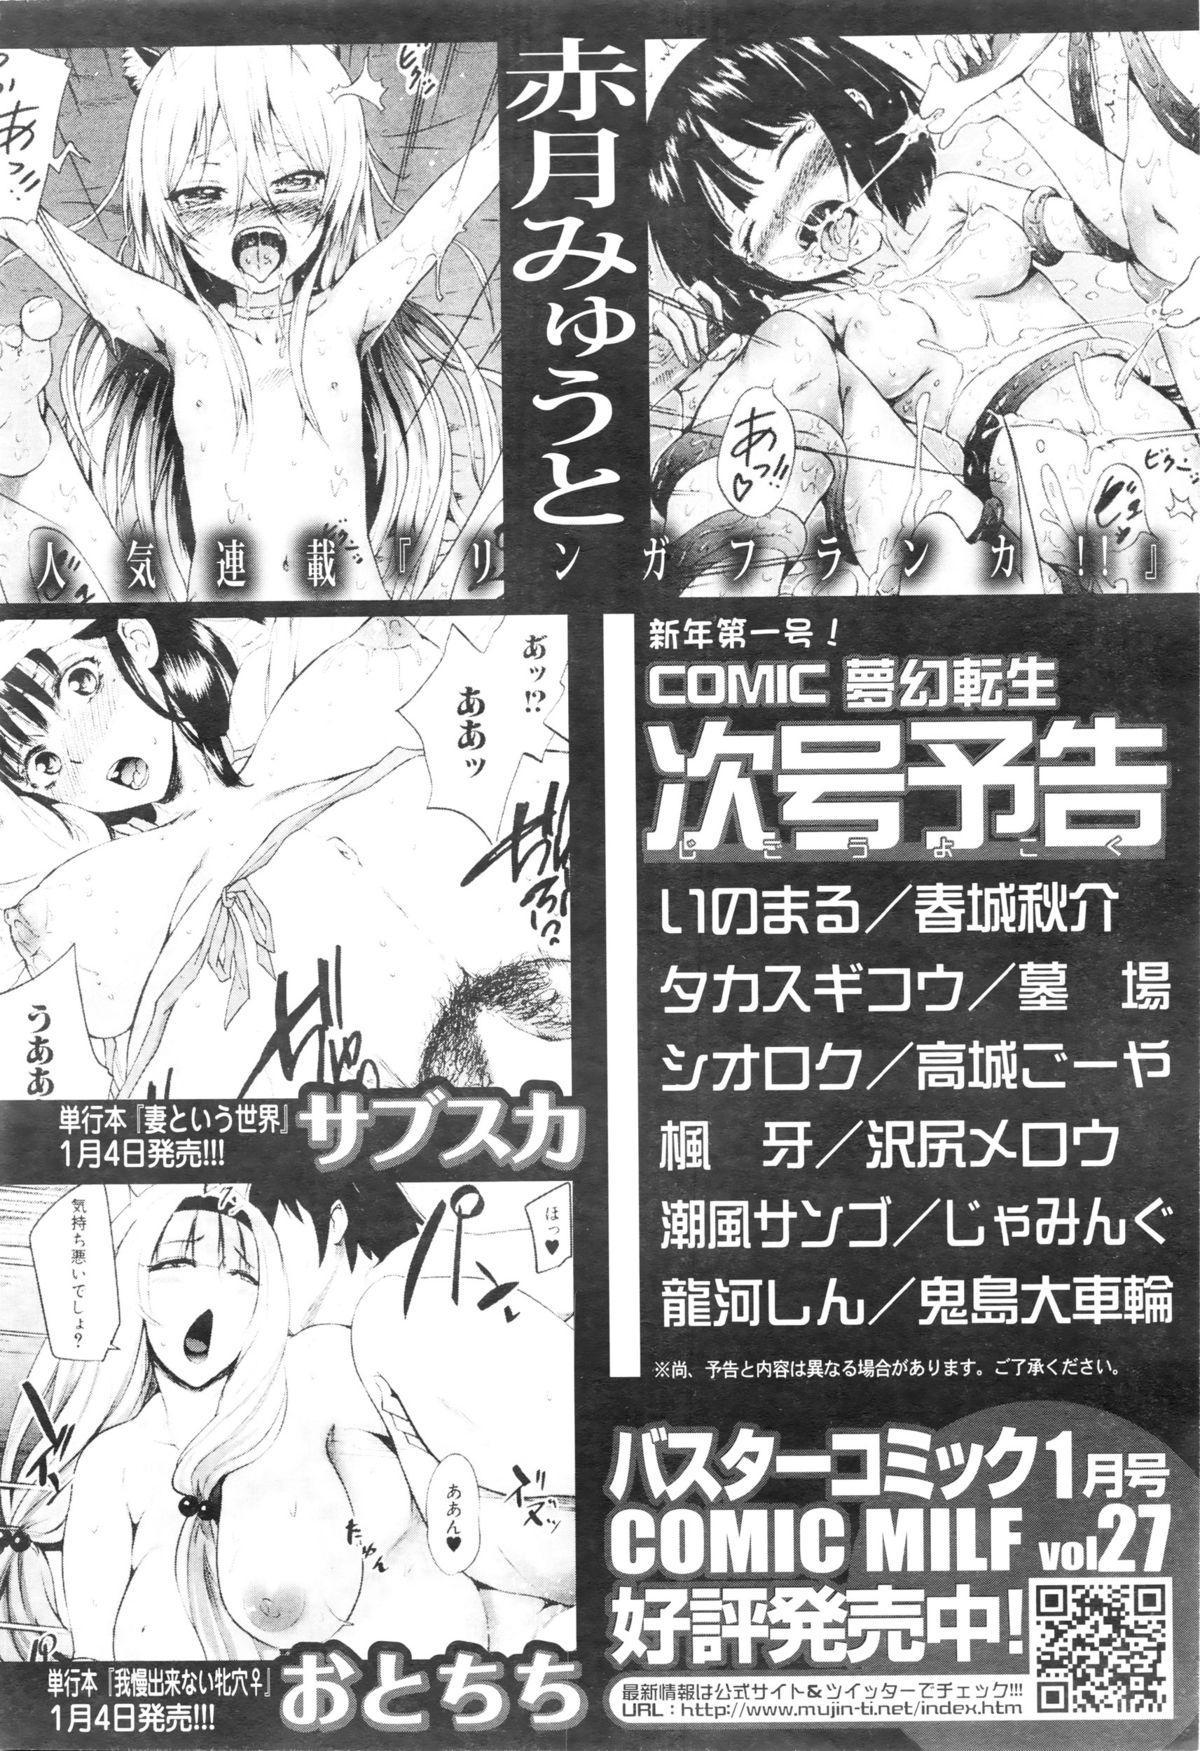 COMIC Mugen Tensei 2016-01 595